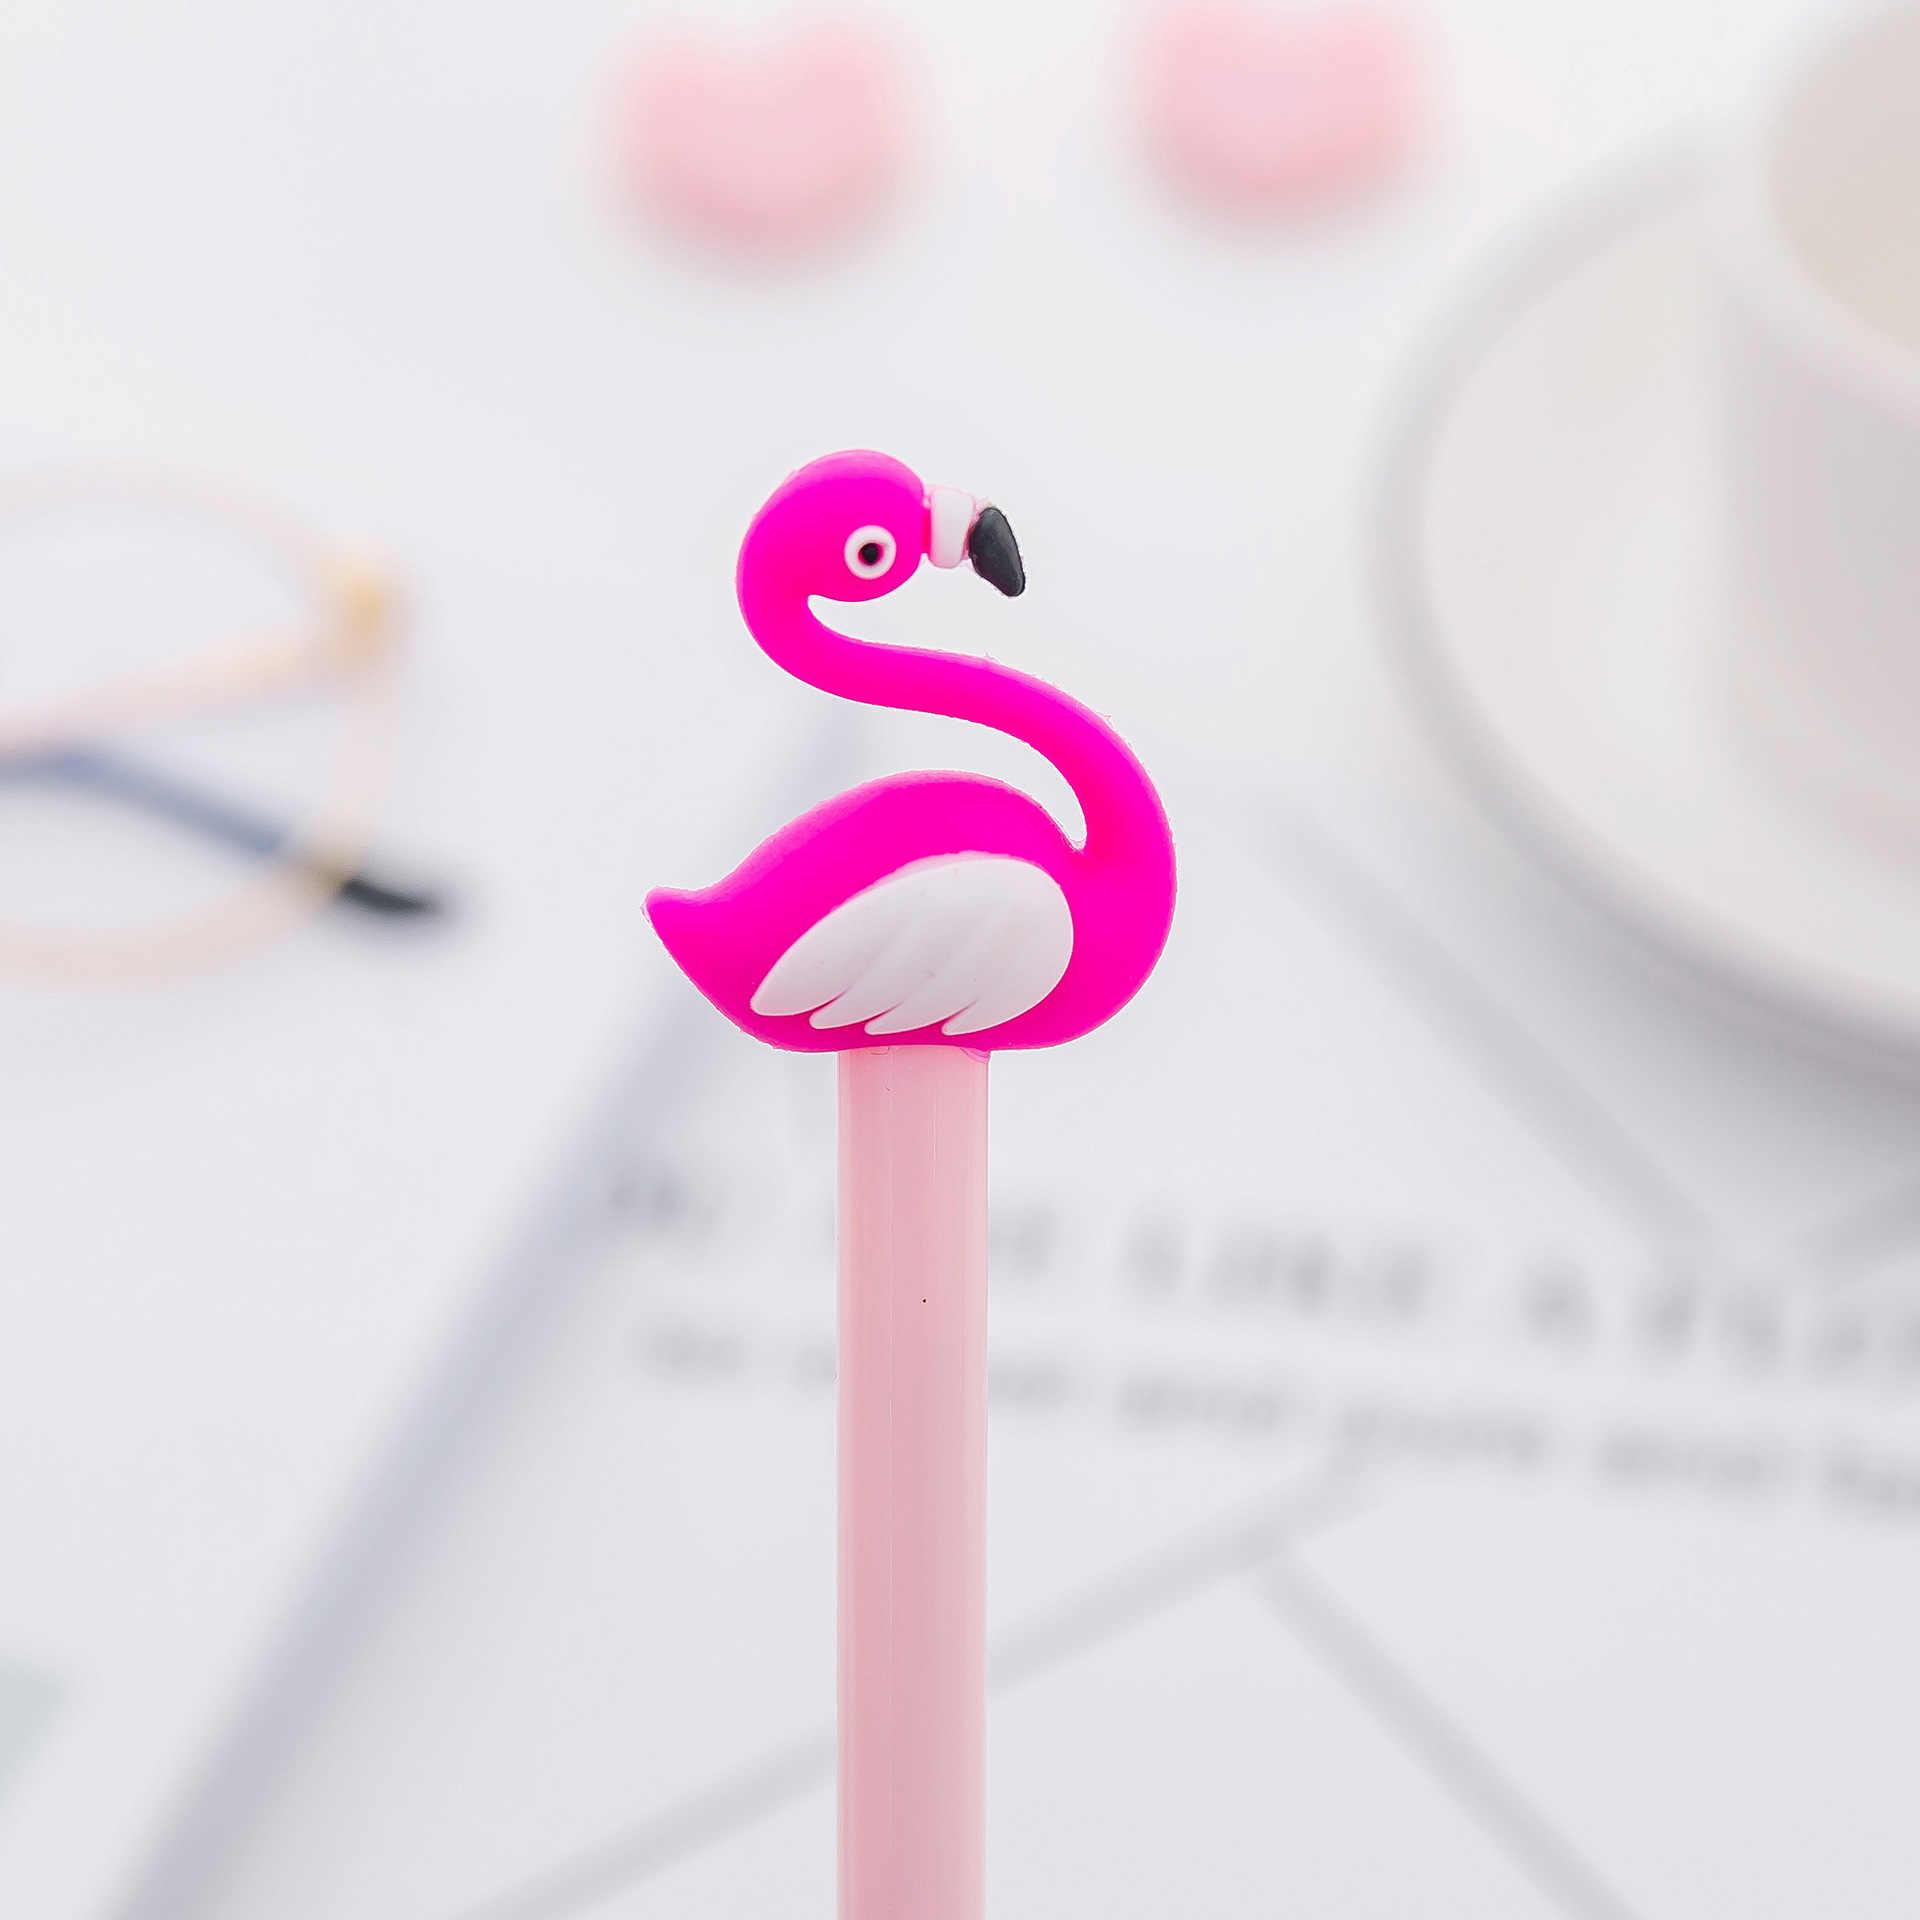 Ellen Brook Nette Flamingo Kawaii Schule Lieferungen Schreibwaren Gel Tinte Stifte Geschenk Schule Schreibwaren Büro Lieferanten Kinder Stift Werkzeug